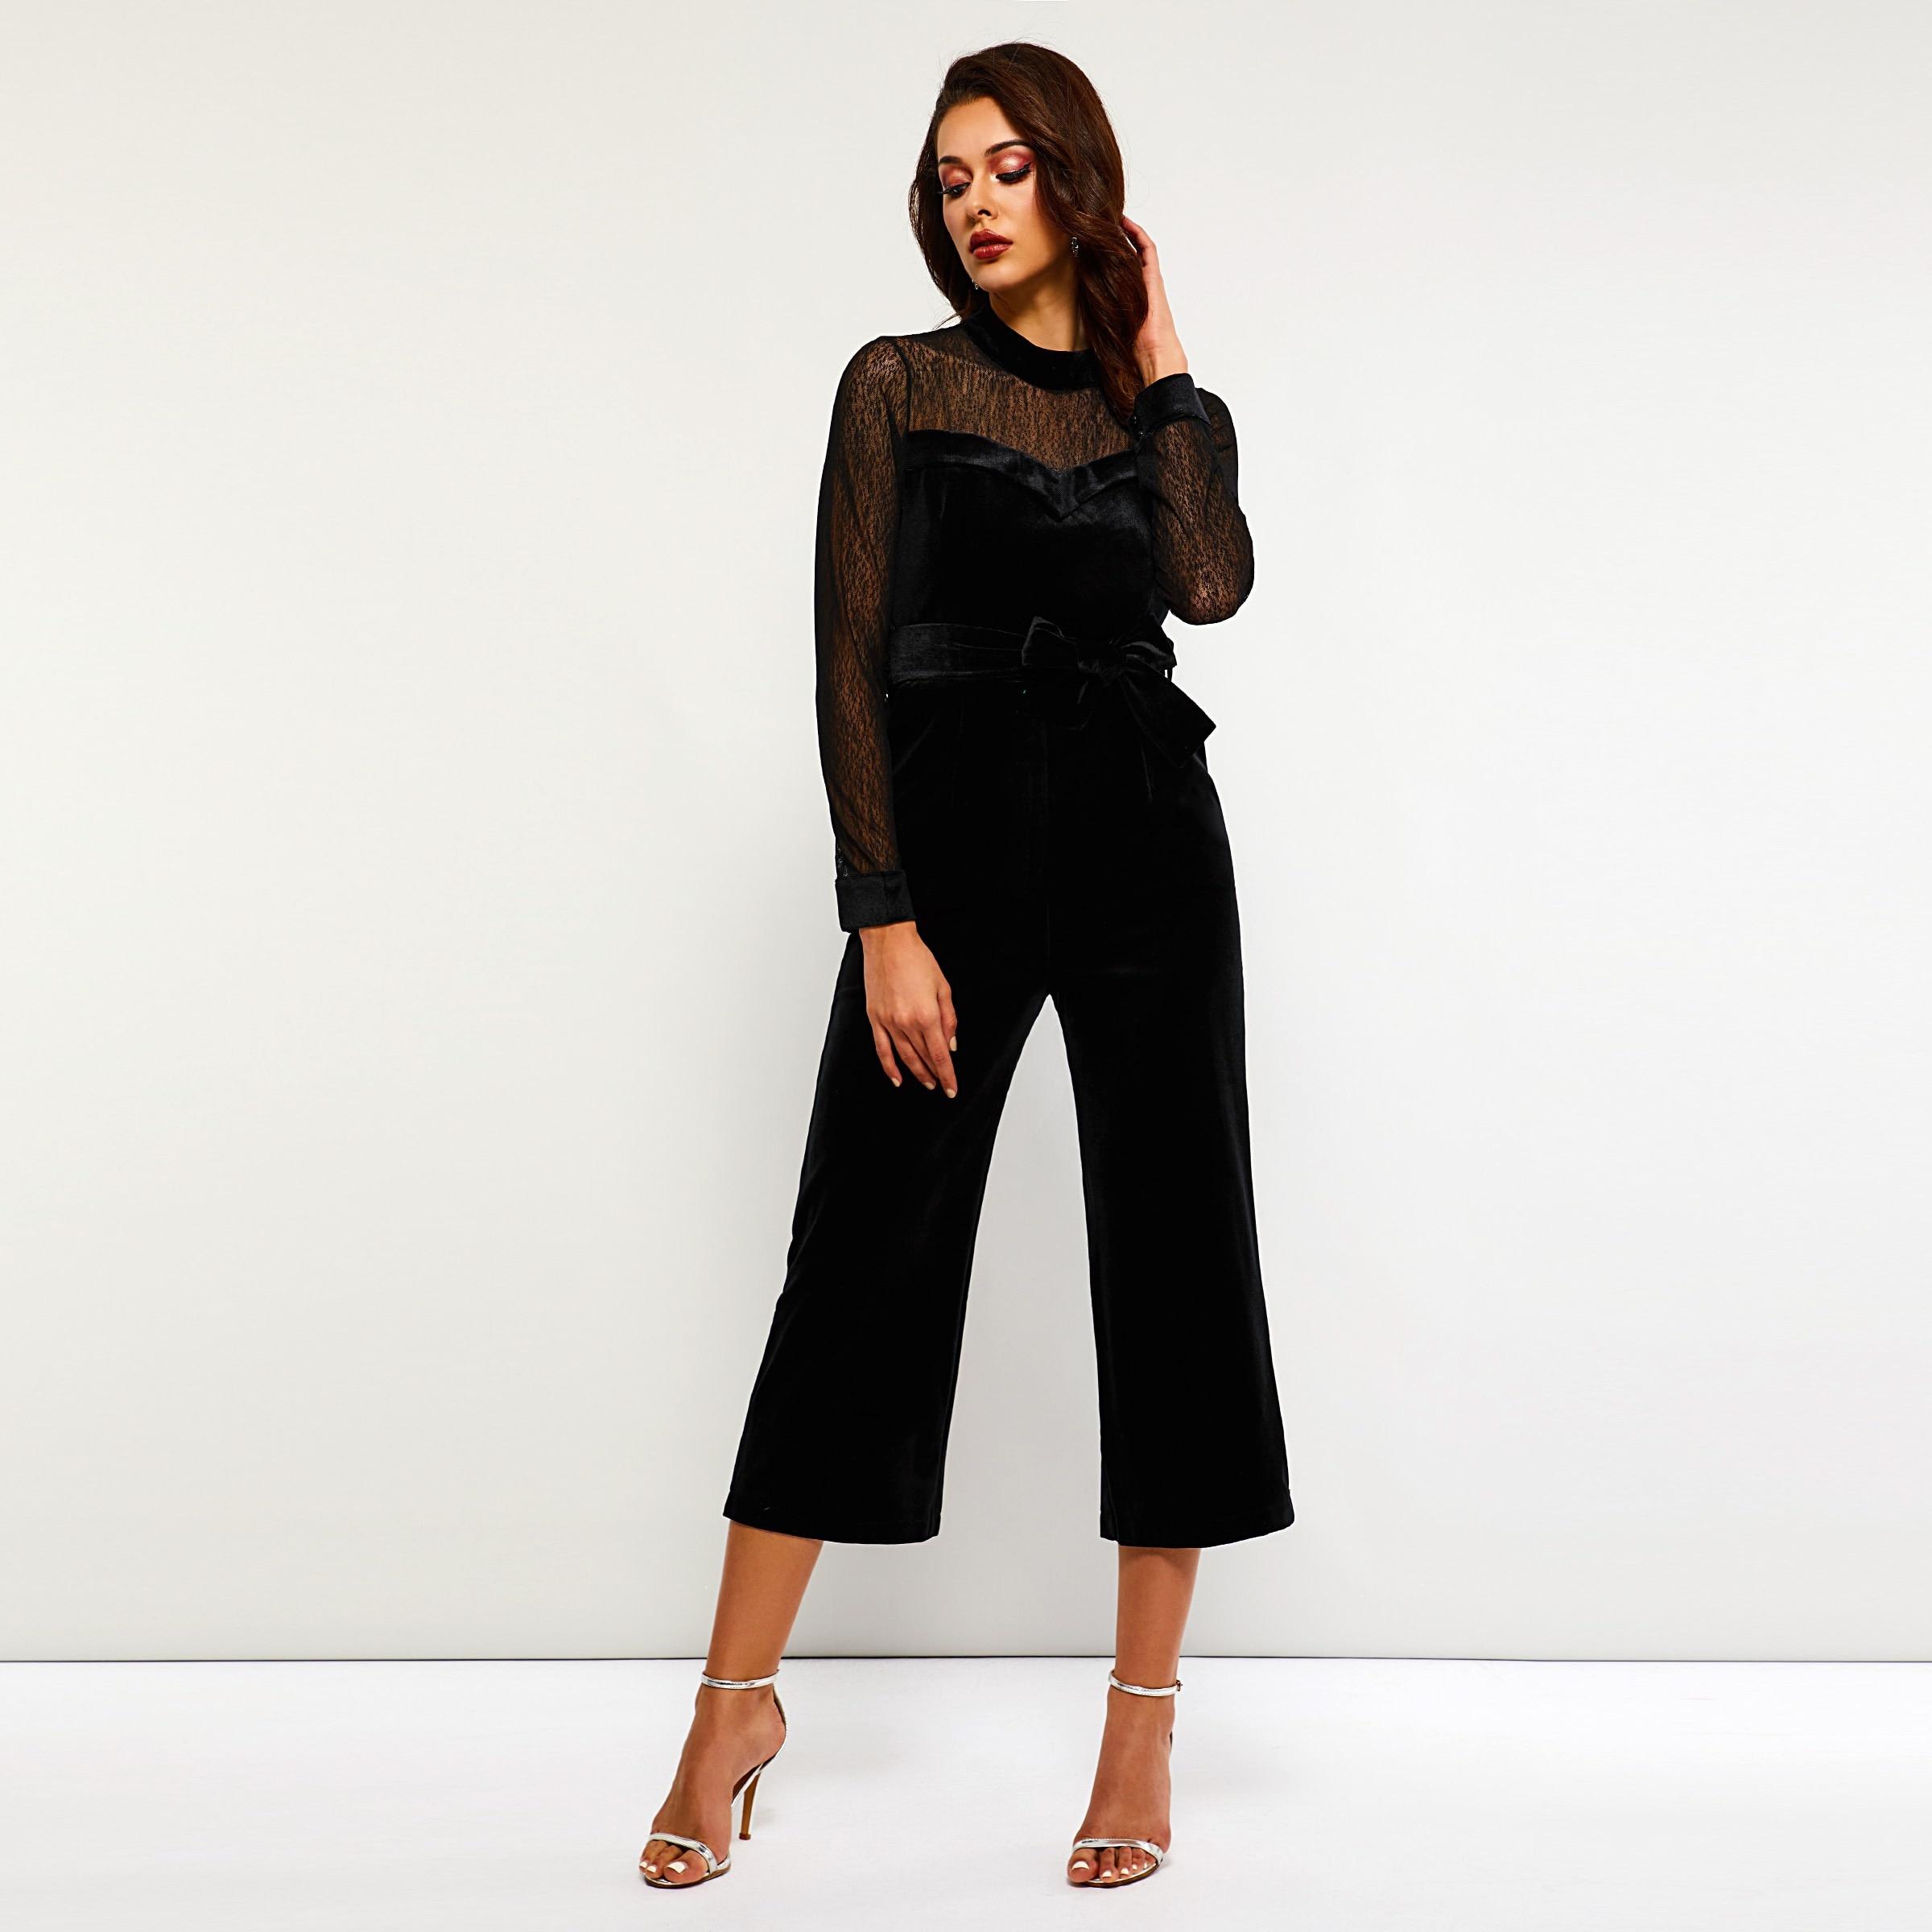 Women Jumpsuits Elegant Casual OL Gothic Slim Wide Legs High Waist Plain Bowknot Female Fall Elegant Goth Black Rompers